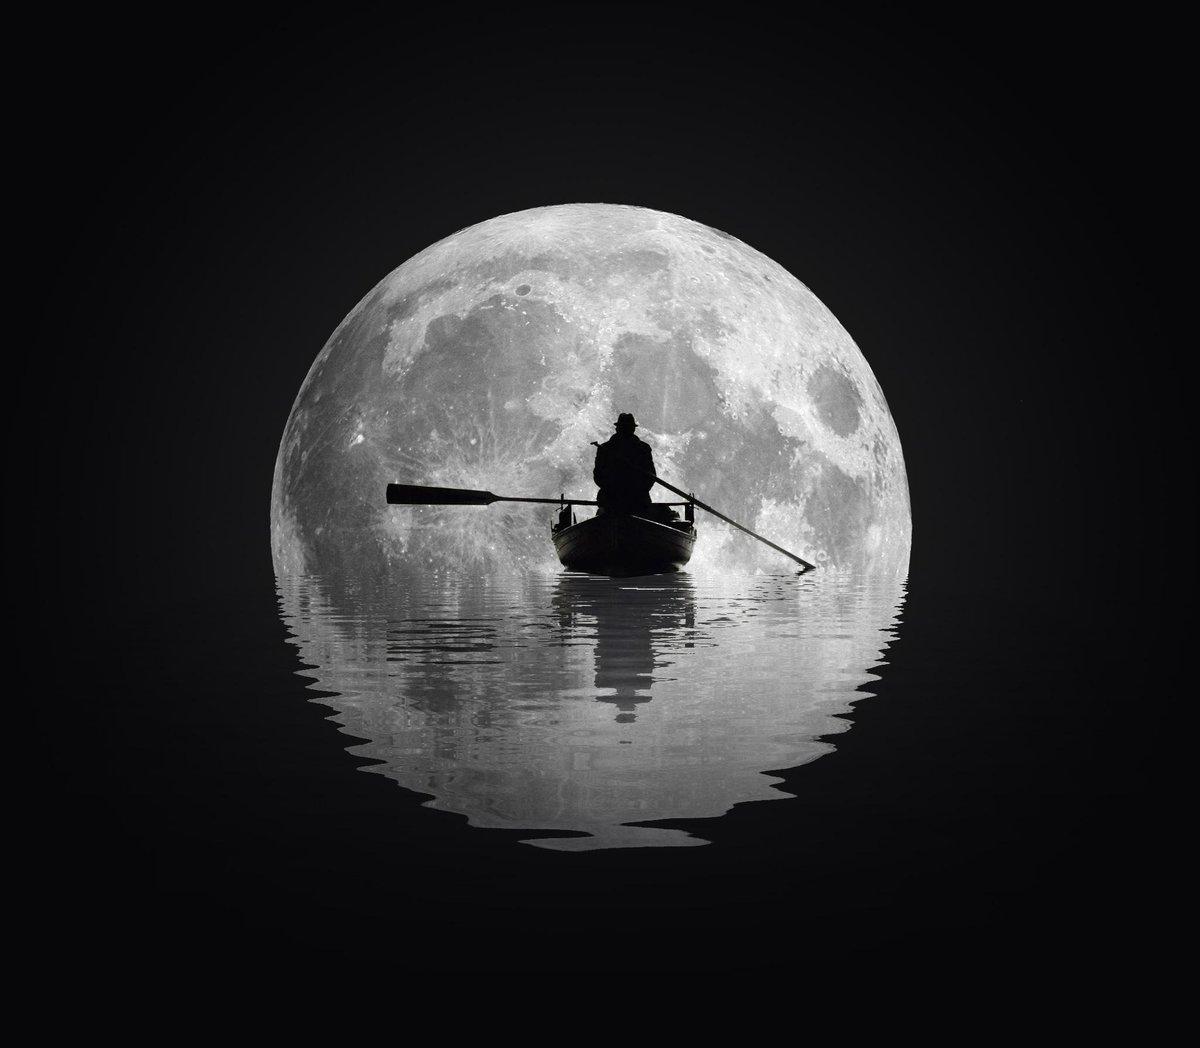 """Moon Ride"" by Arun Kumar https://t.co/BmsP8dVcQT #Photo #500px http://t.co/zfC5GbqEkr"